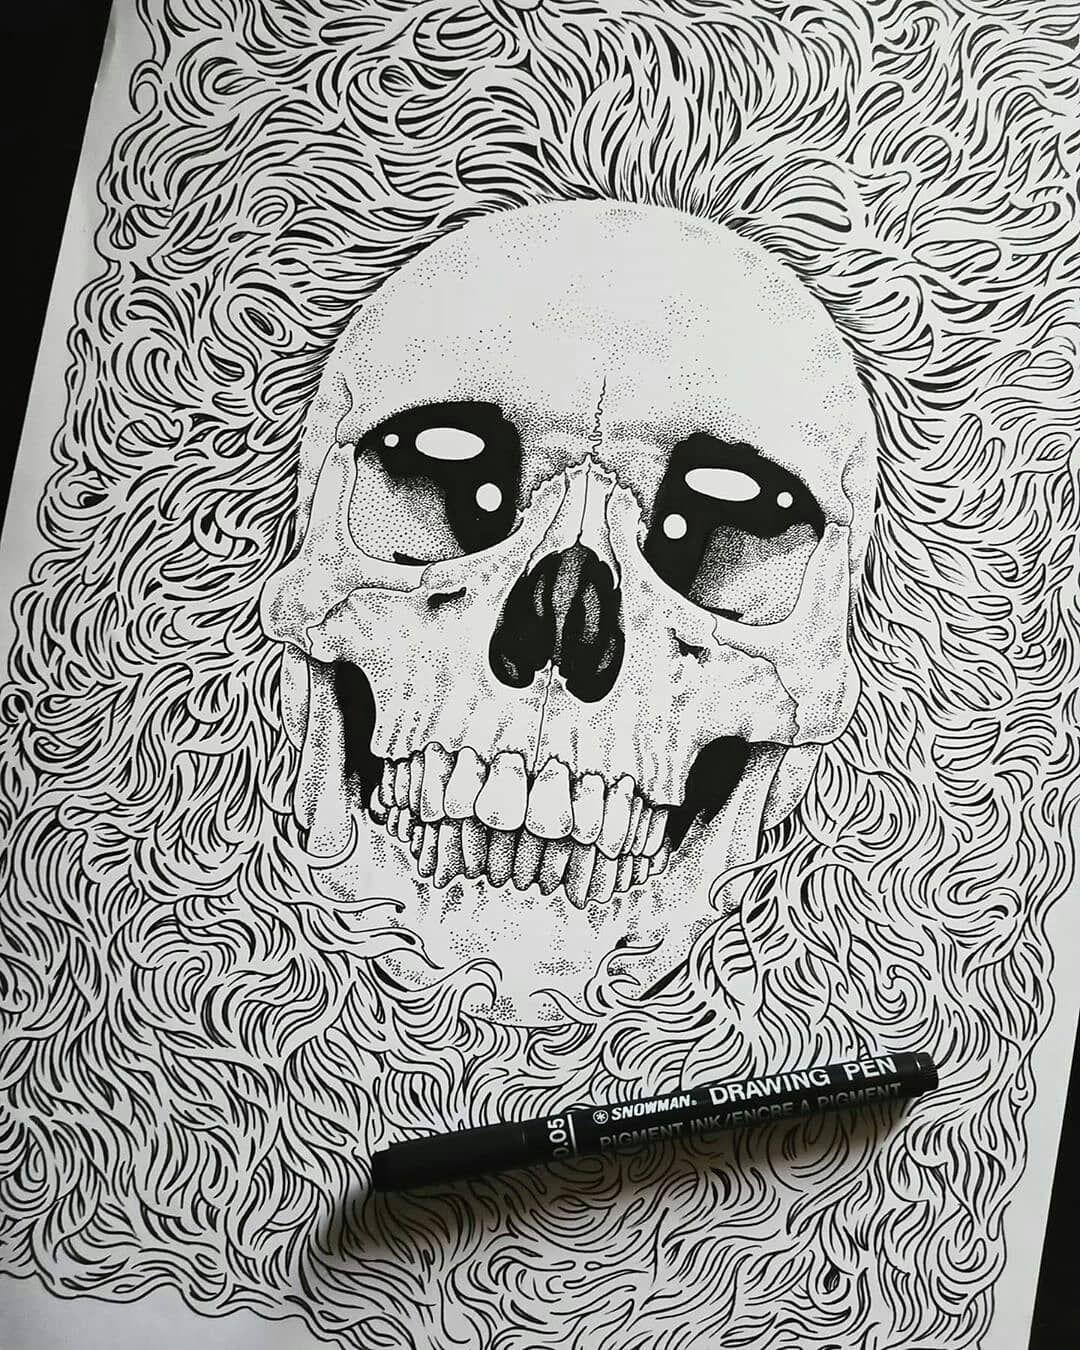 Reposted from @gilangsaharaart Keep smiling  #art #drawing #instaart #artwork #dotwork #skull #design #illustration #instaartist #draw #hatching #blackwork #blackandwhite #pointilism #sketch #lineart #dotworkers #crosshatcing #thrashmetal #graphicdesign #metal #longhair #indonesia - #regrann